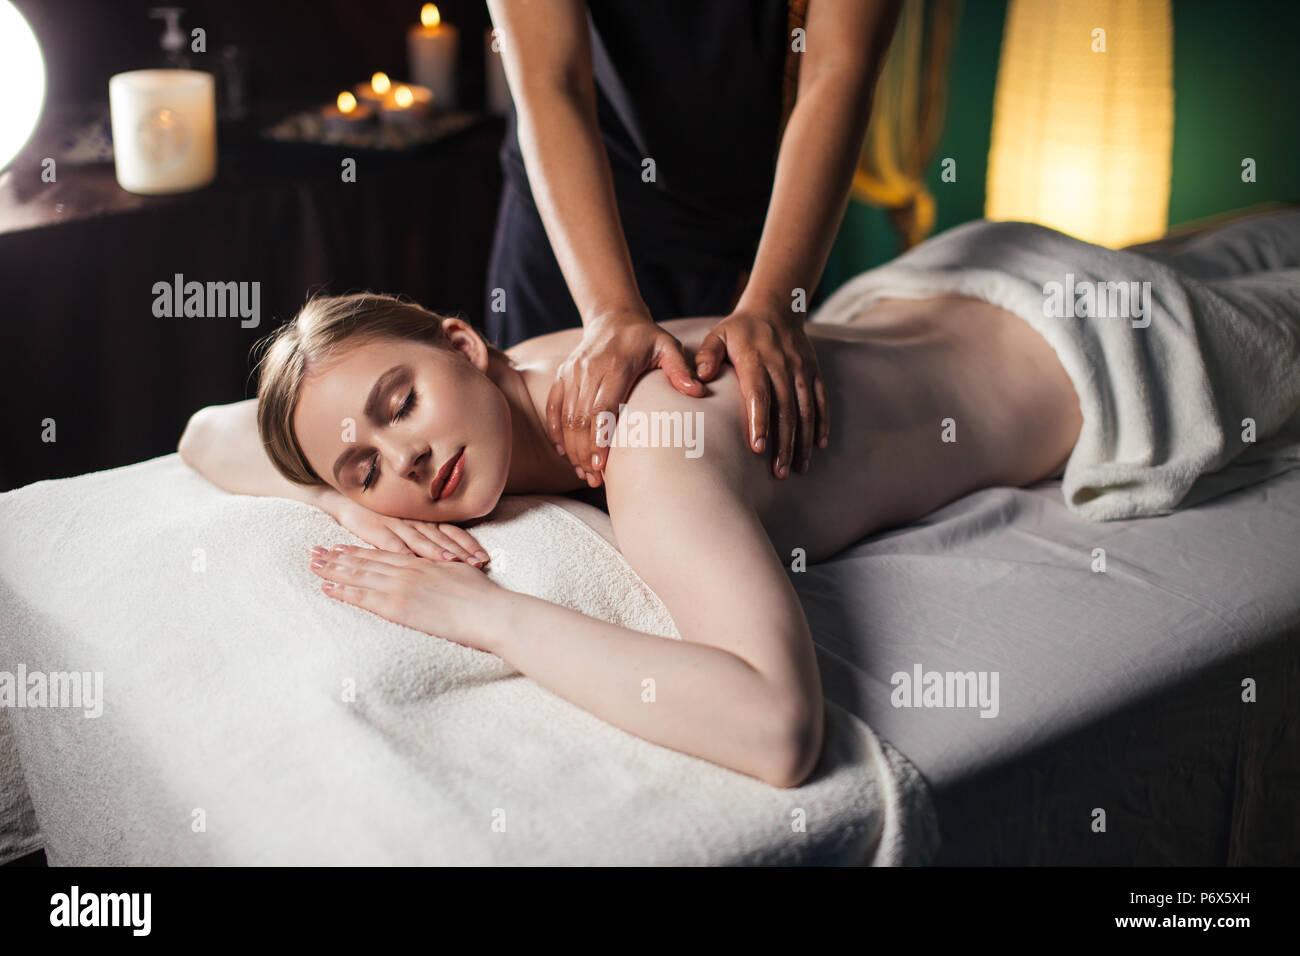 pettorali tittes